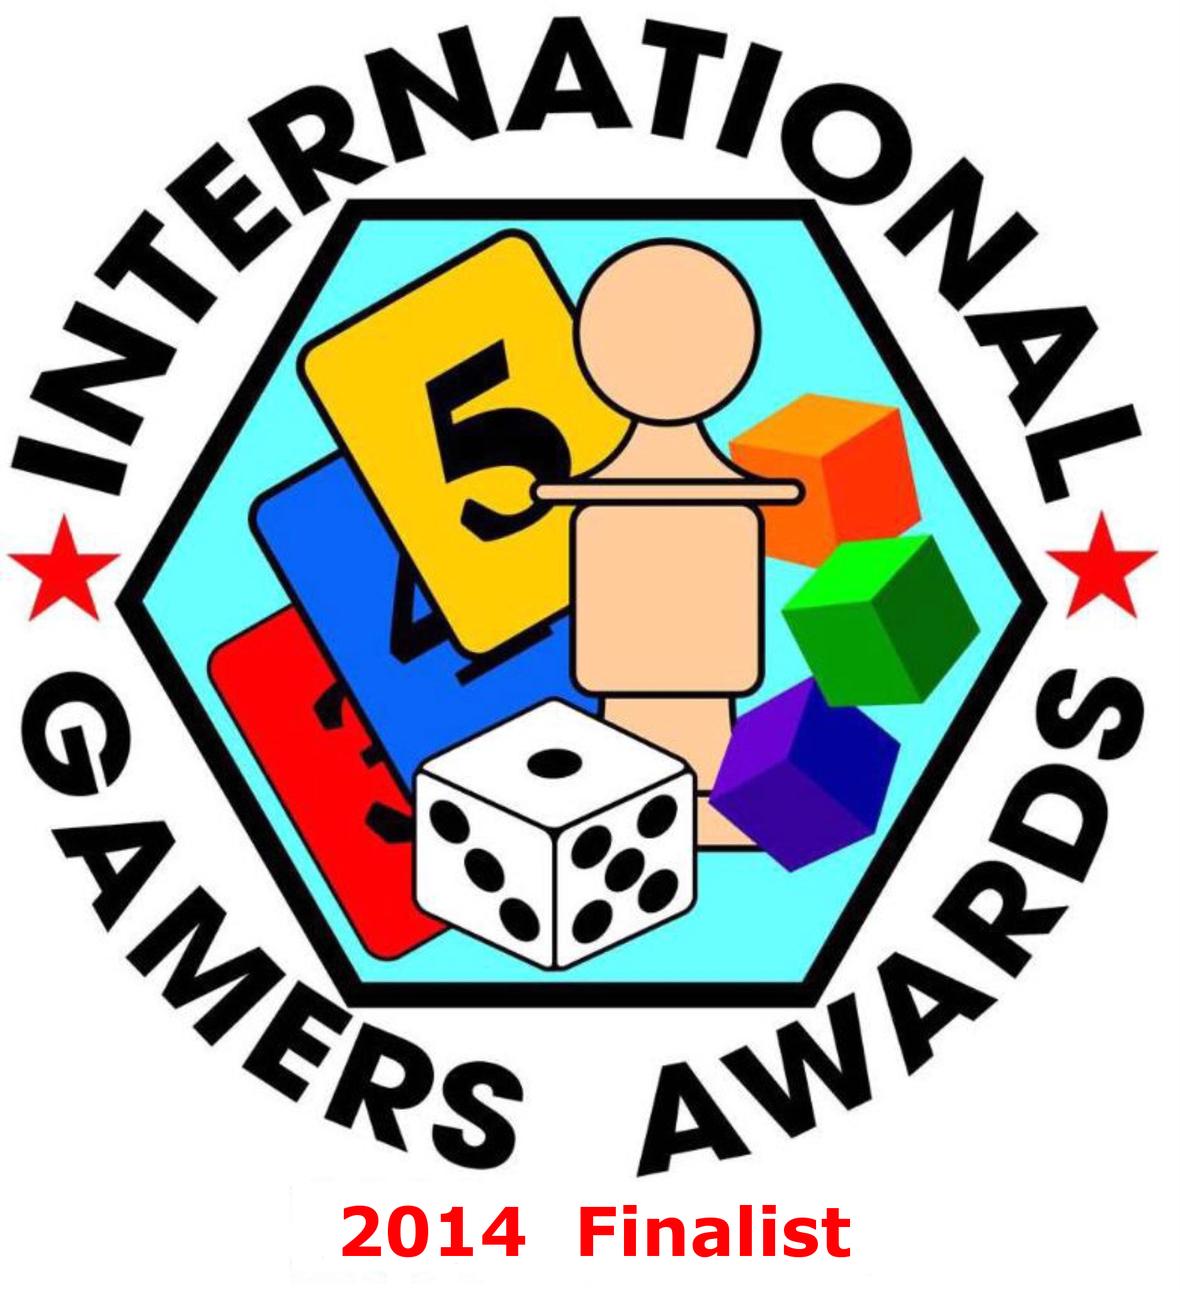 IGA 2014 Finalist